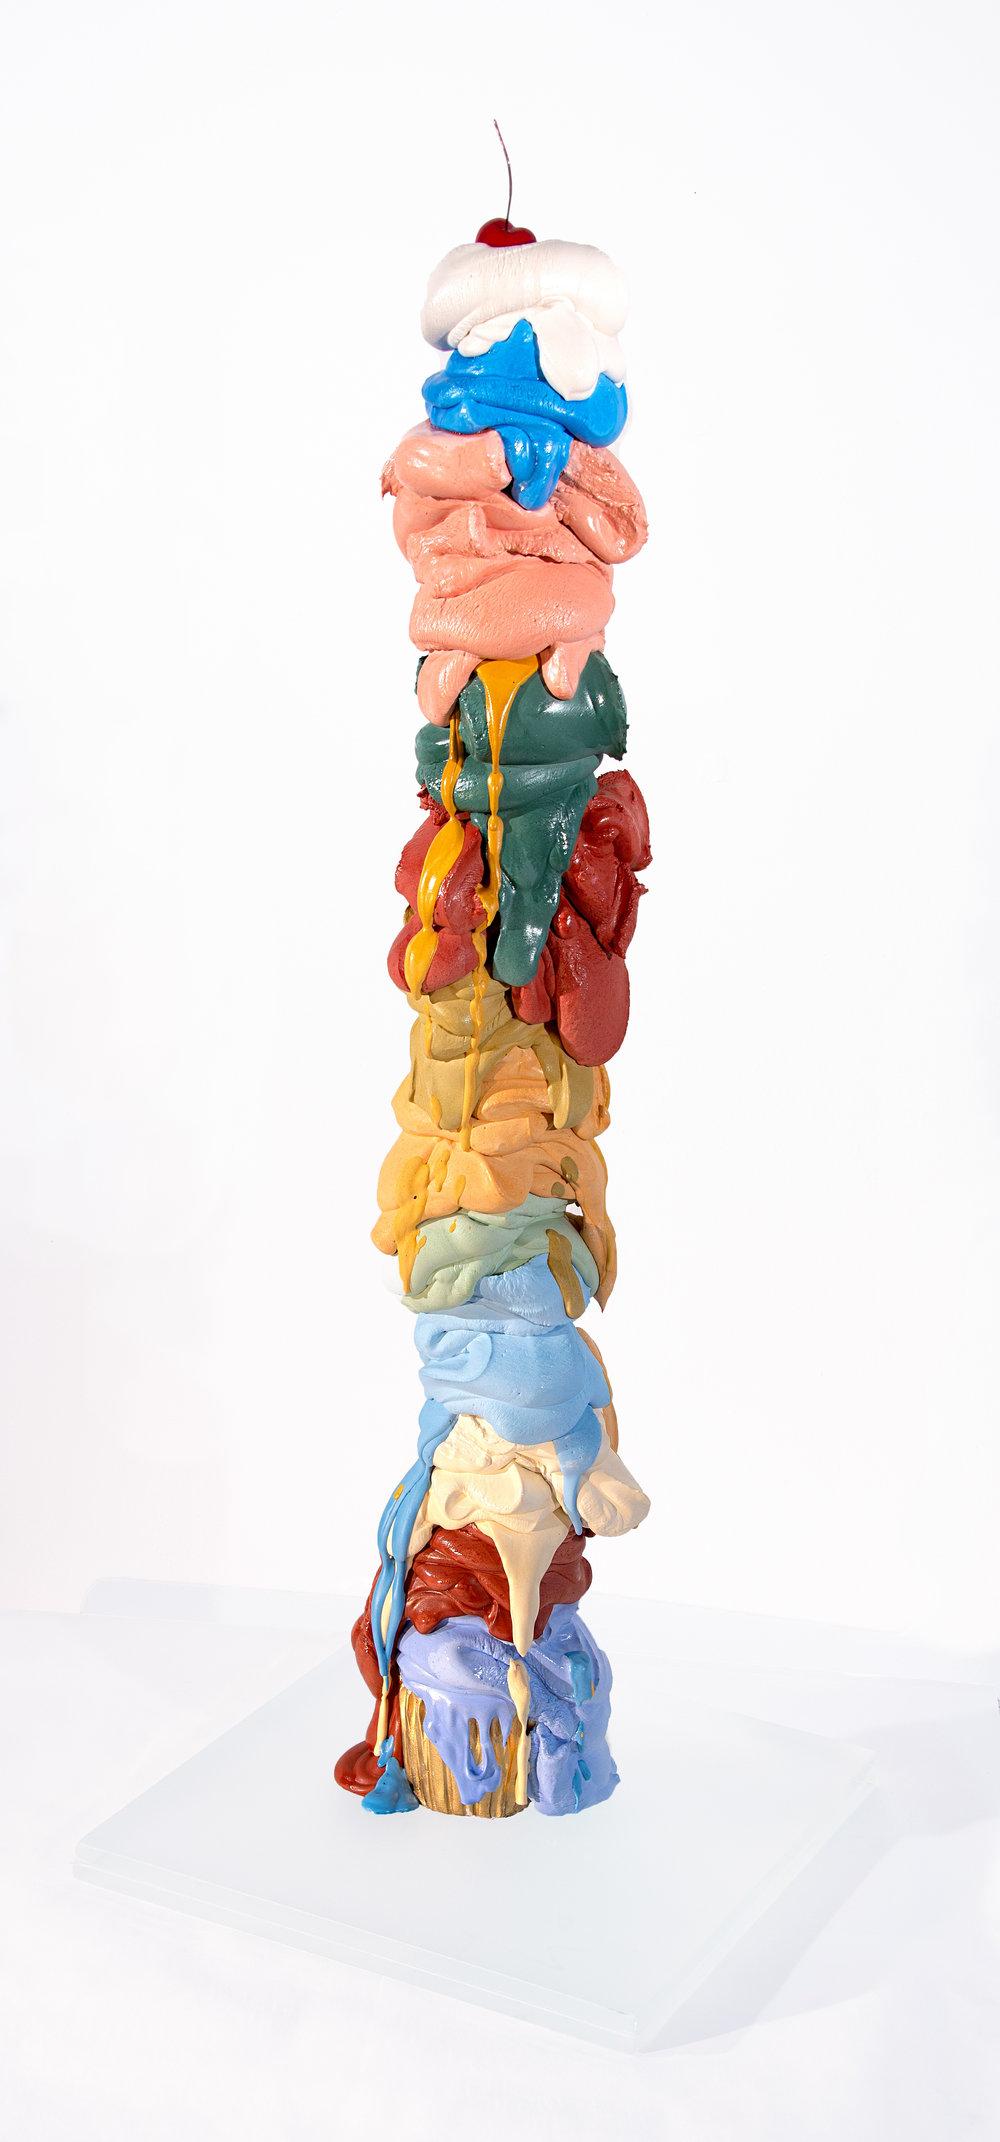 "Over The Rainbow - Olivia Bonilla32"" x 10"" x 10""Cement, glass, resin$2200"